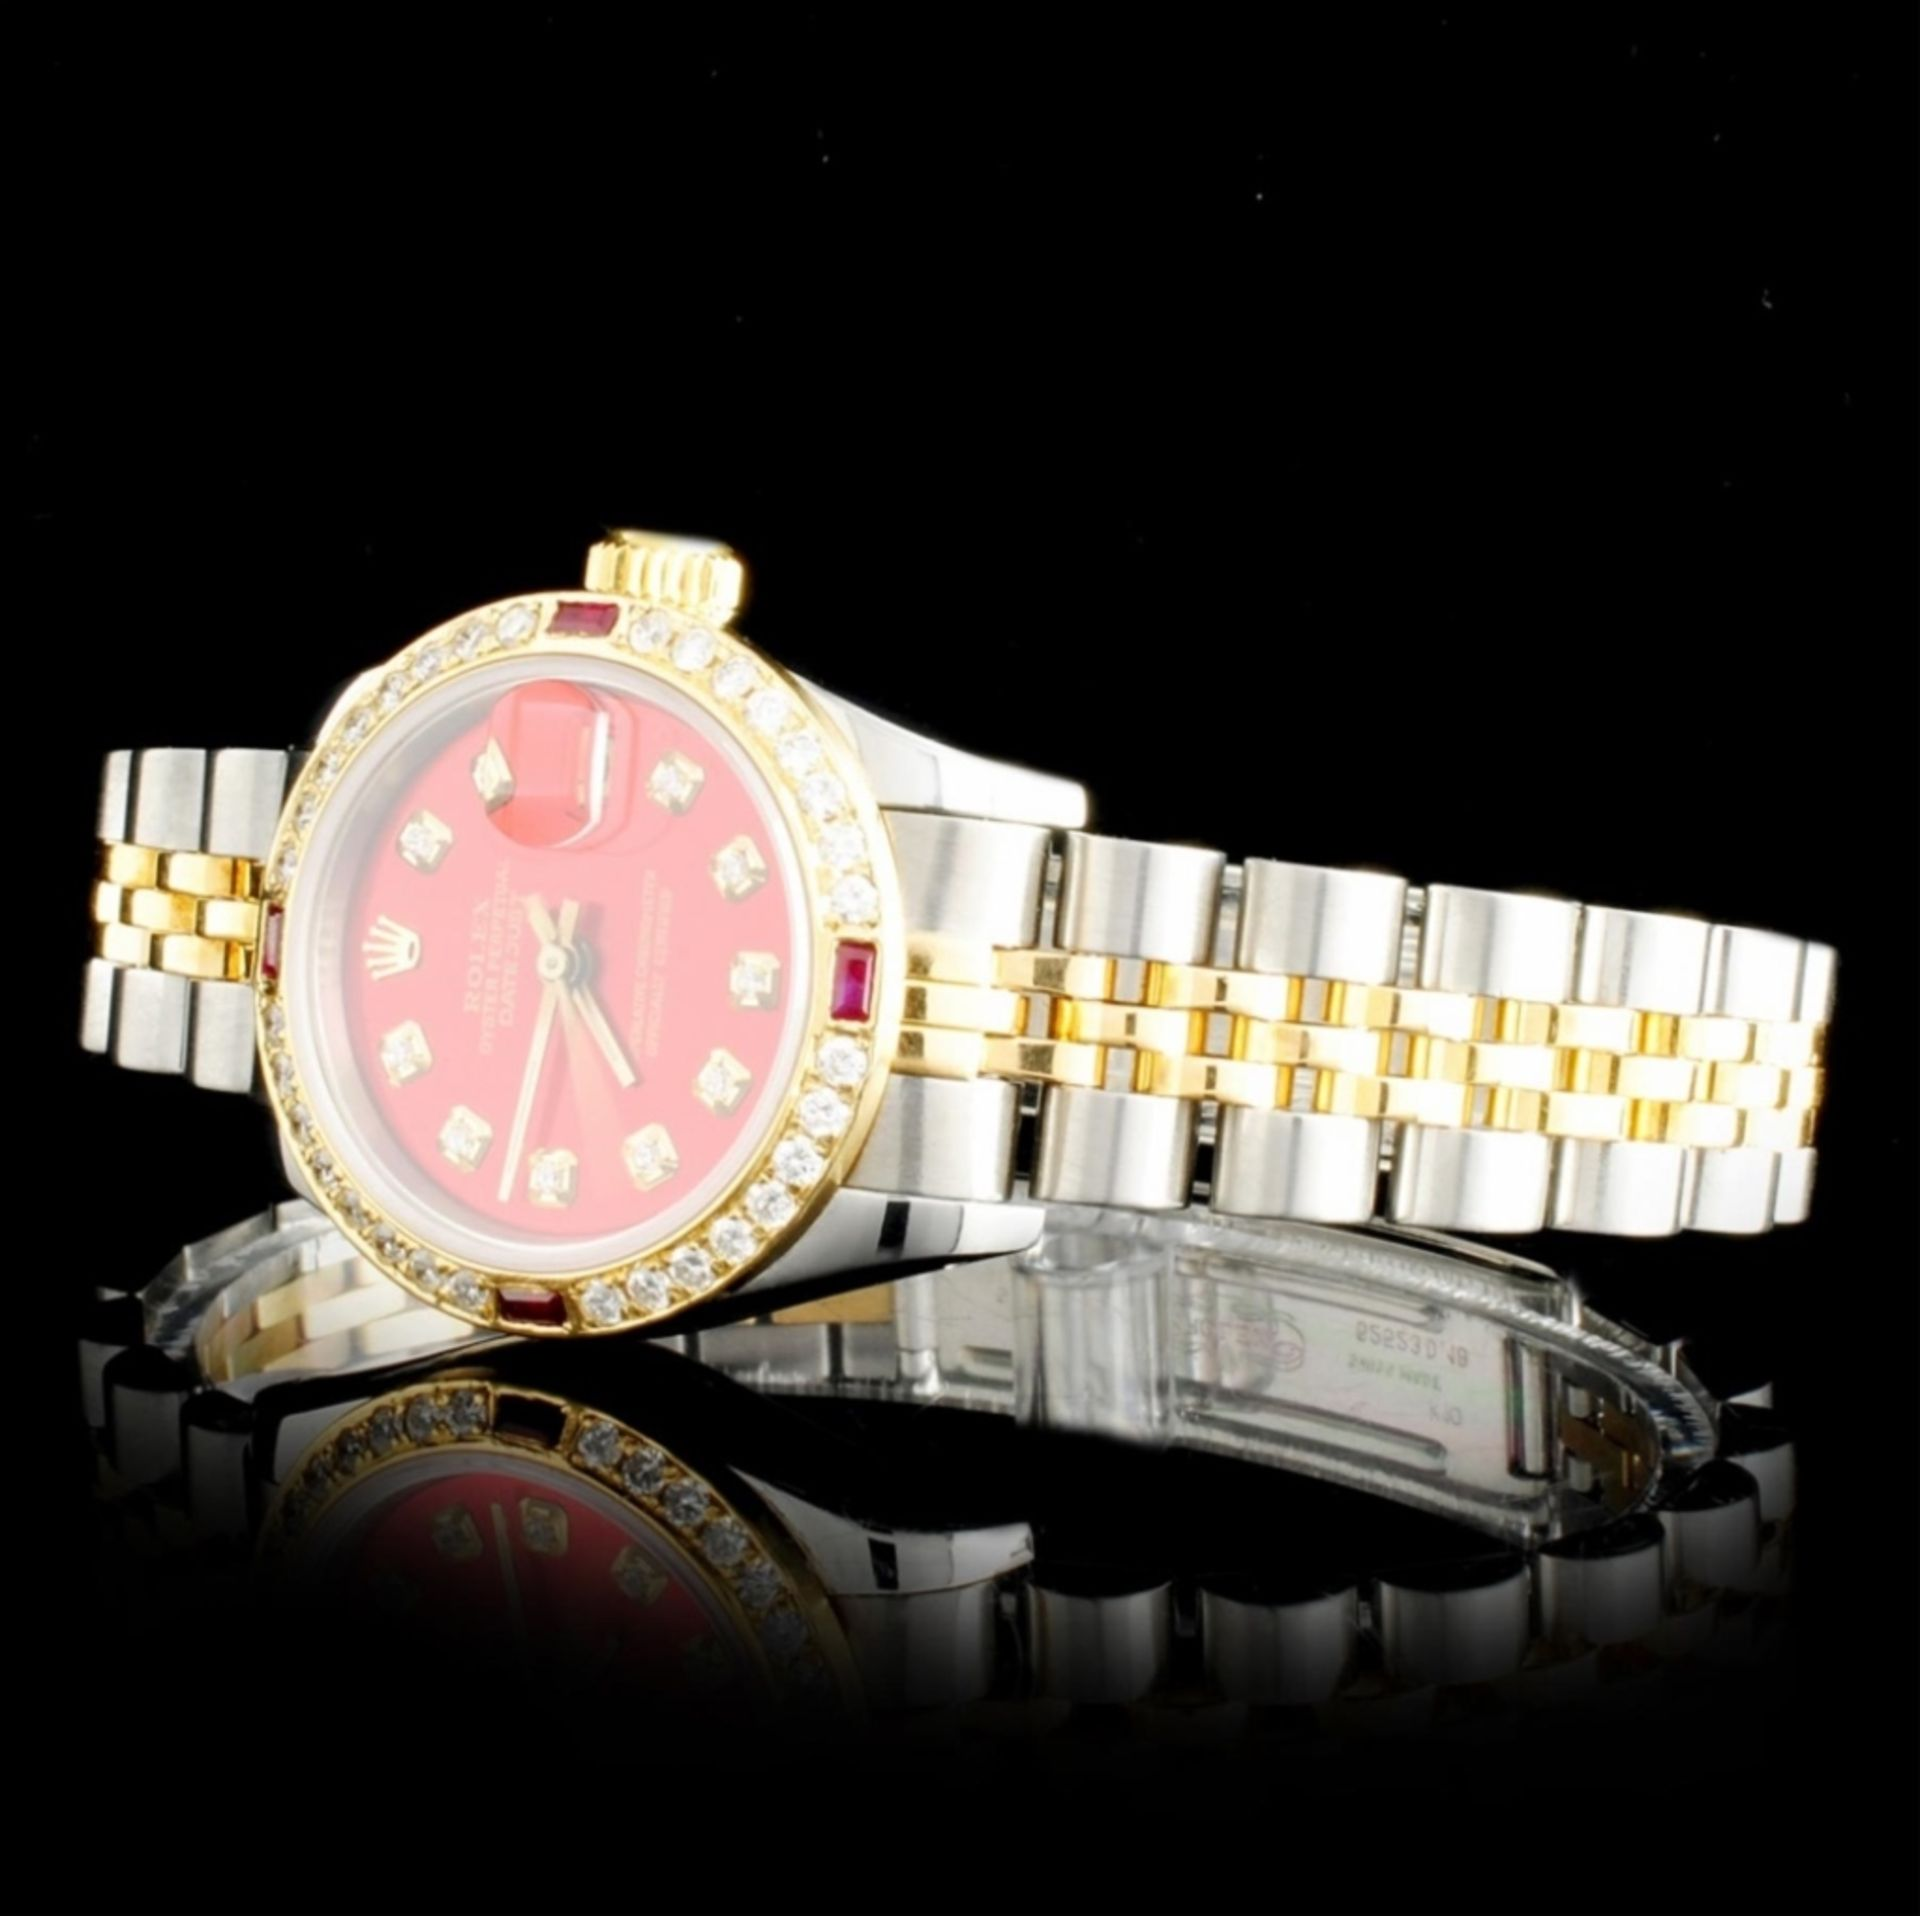 Rolex YG/SS DateJust Diamond Ladies Watch - Image 2 of 5